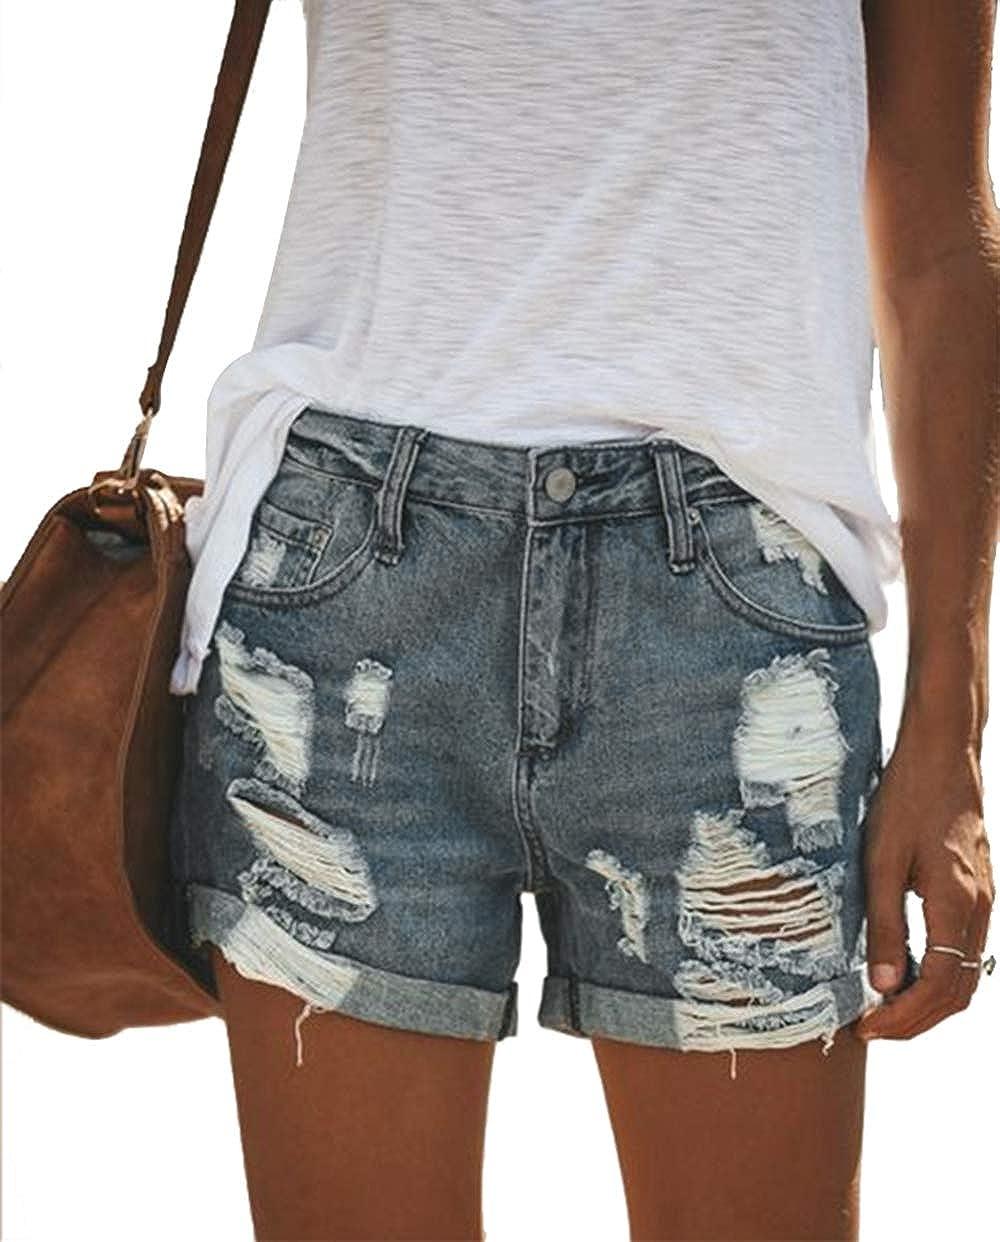 Uni-Wert Damen Jeansshorts Basic in Aged-Waschung Jeans Bermuda-Shorts High Waist Denim Kurze Hose Sommer Mode Destroyed Loch Hotpants Shorts